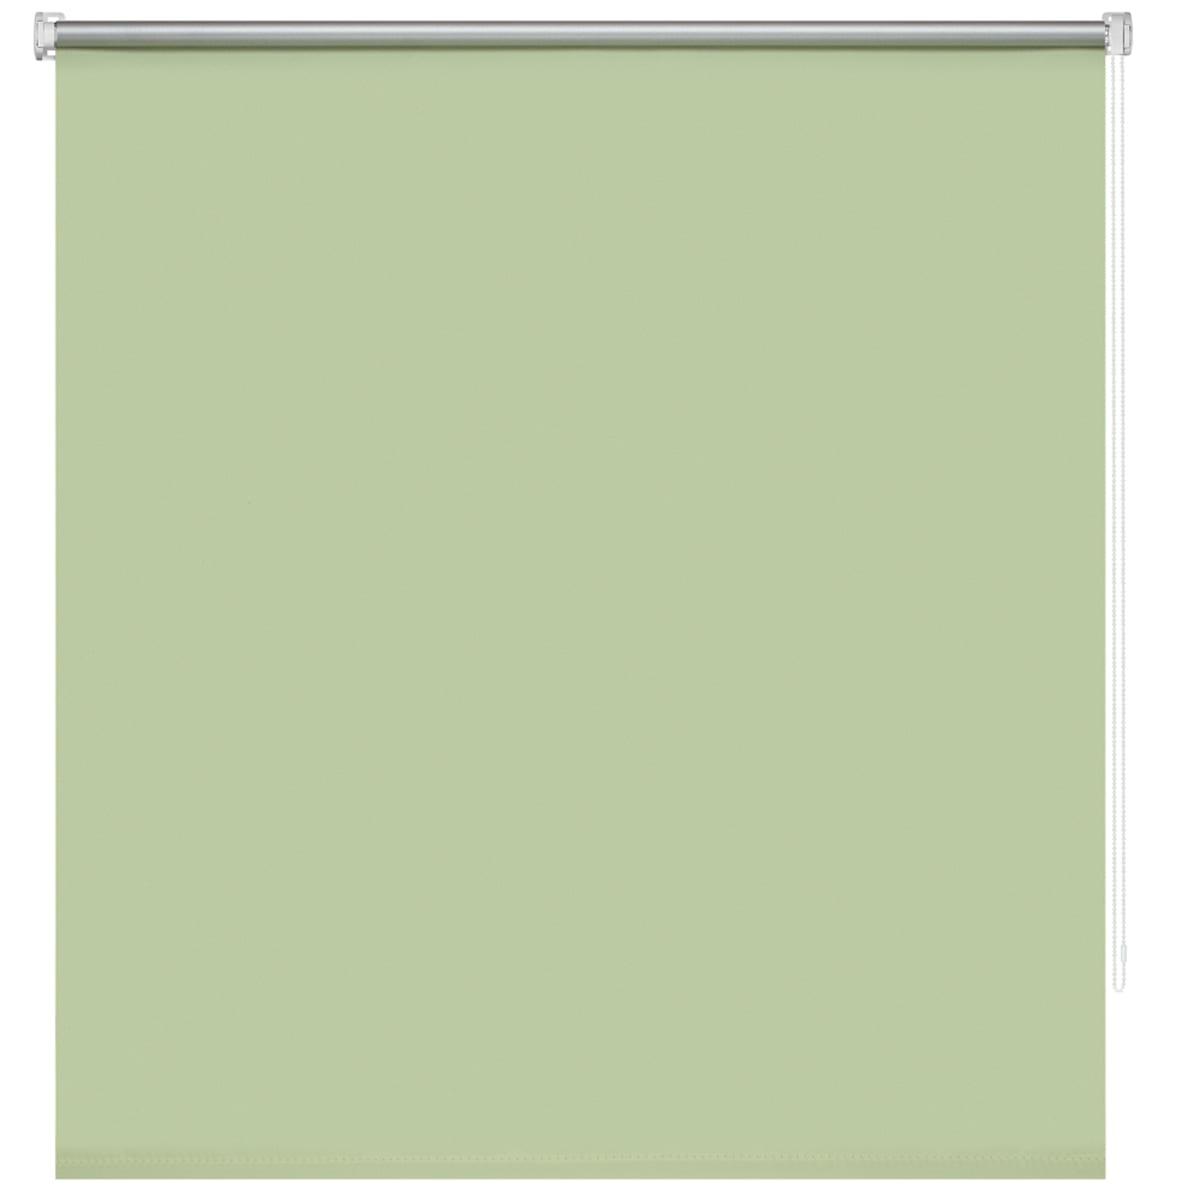 Рулонная штора Decofest Плайн 60х160 см, цвет зеленый